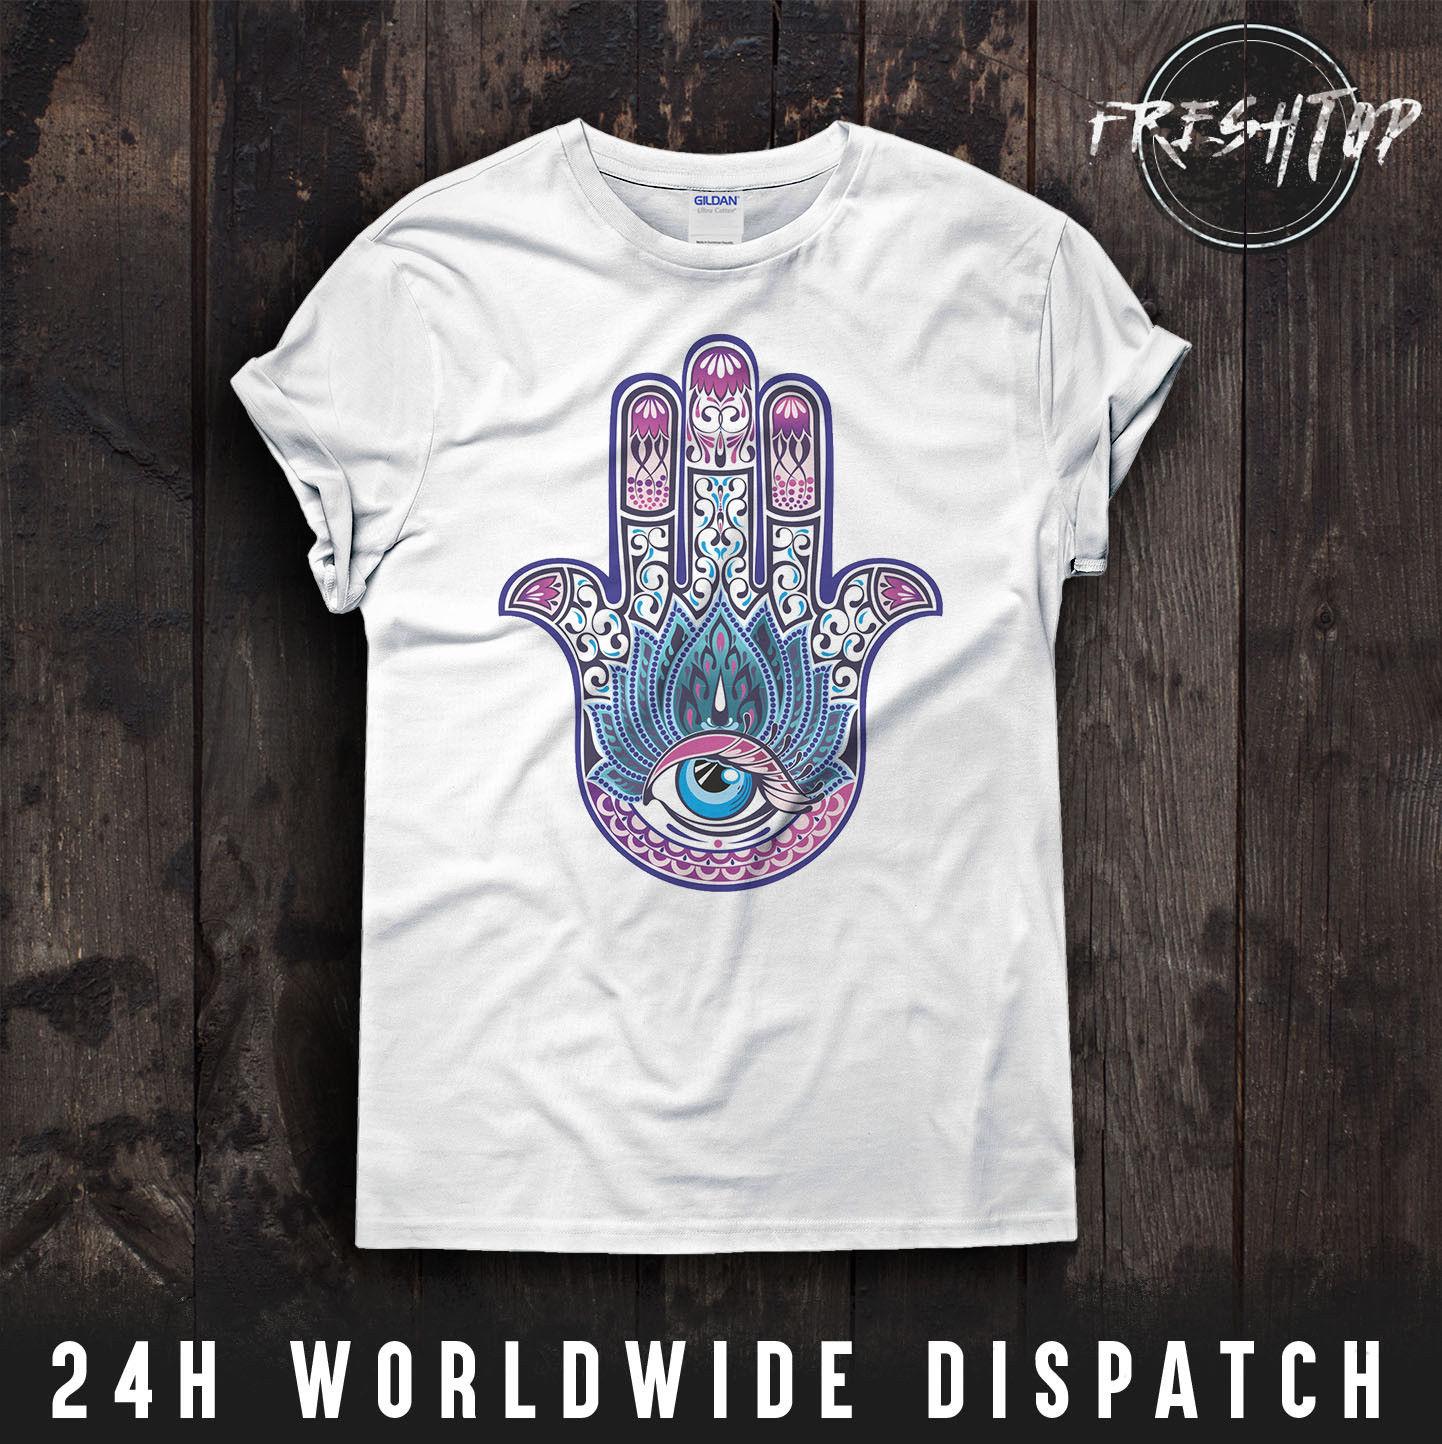 31cbb7da Buy Hamsa T Shirt and get free shipping on AliExpress.com